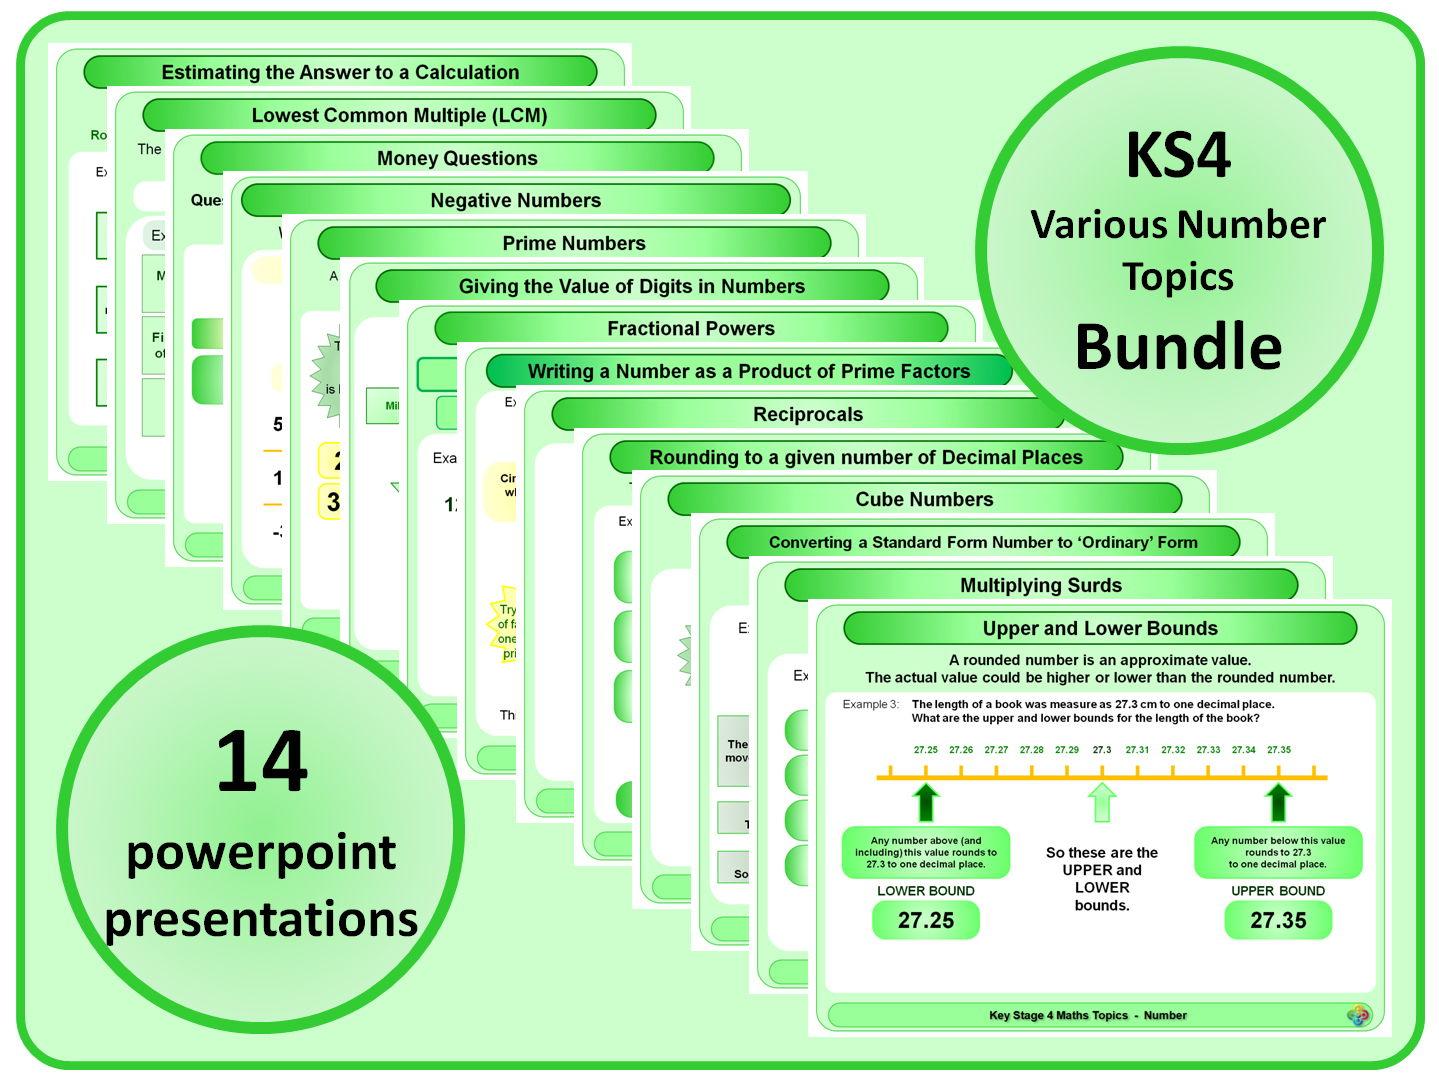 KS4 Various Number Topics BUNDLE